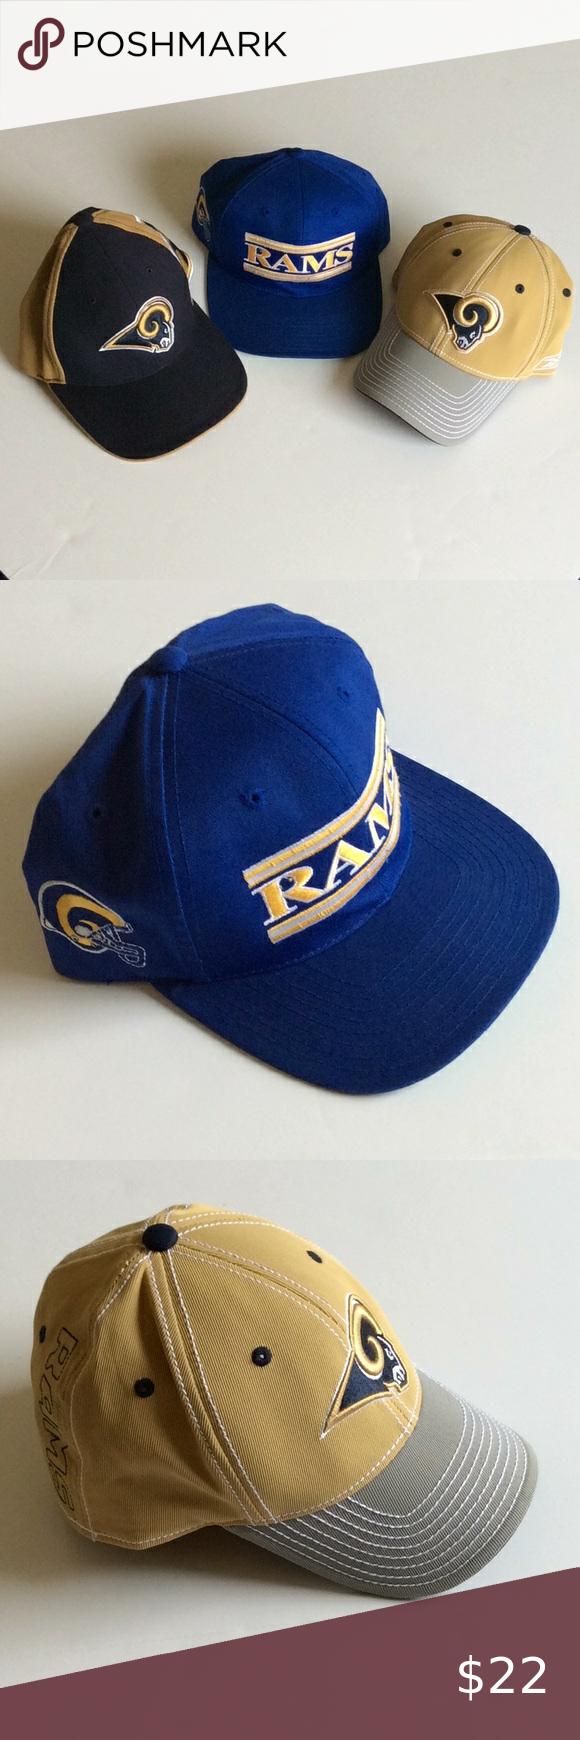 Rams Hats 2 Reebok 1 Annco Vintage Trucker Style